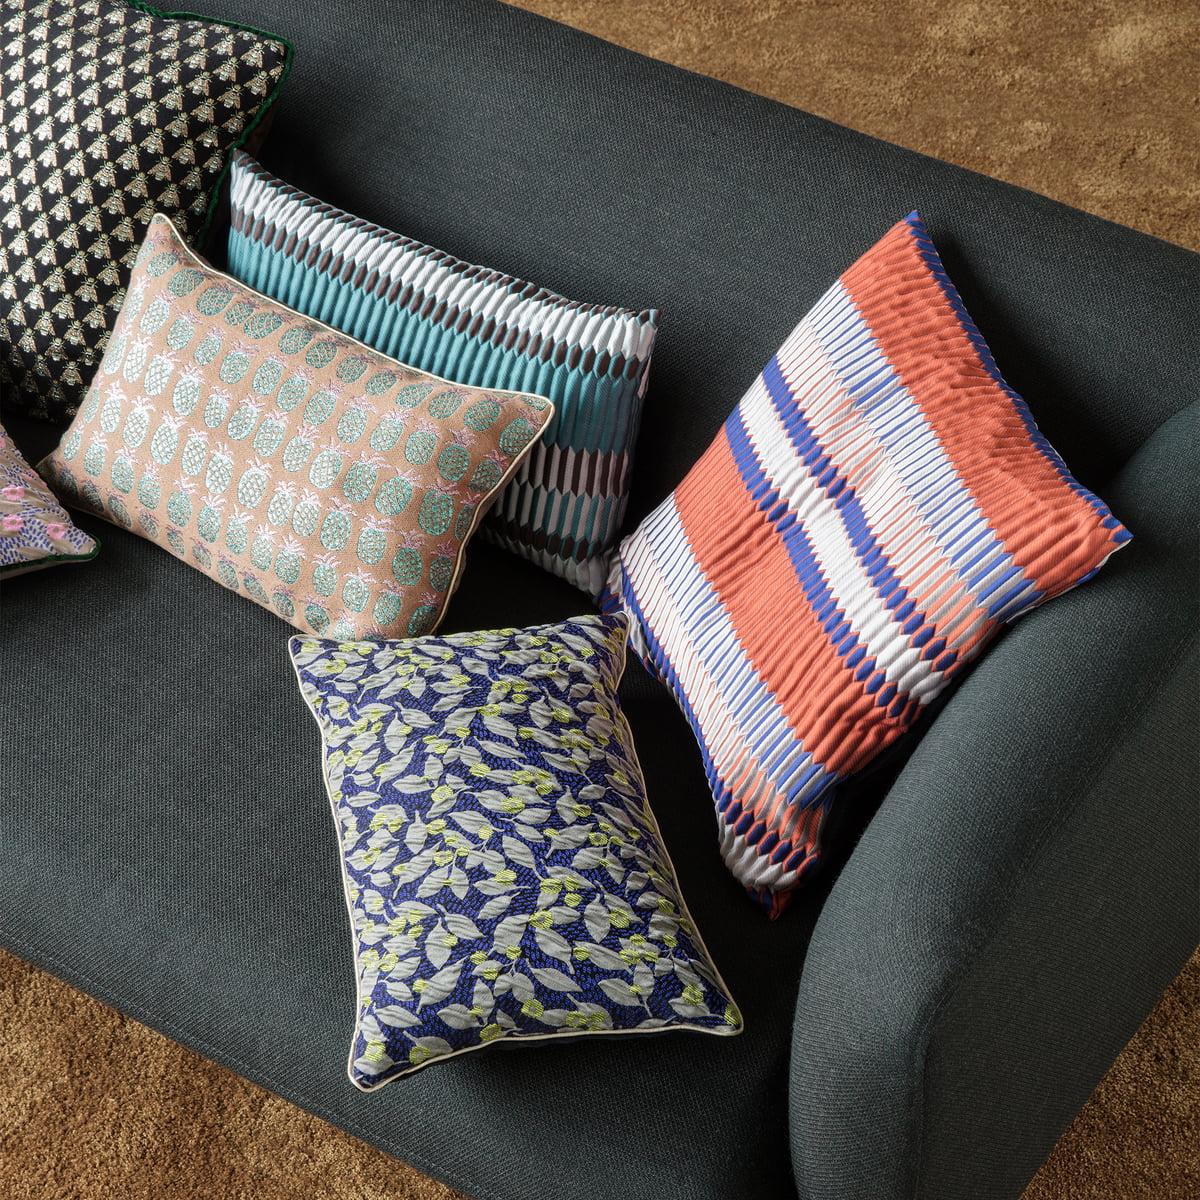 salon kissen quadratisch von ferm living connox. Black Bedroom Furniture Sets. Home Design Ideas